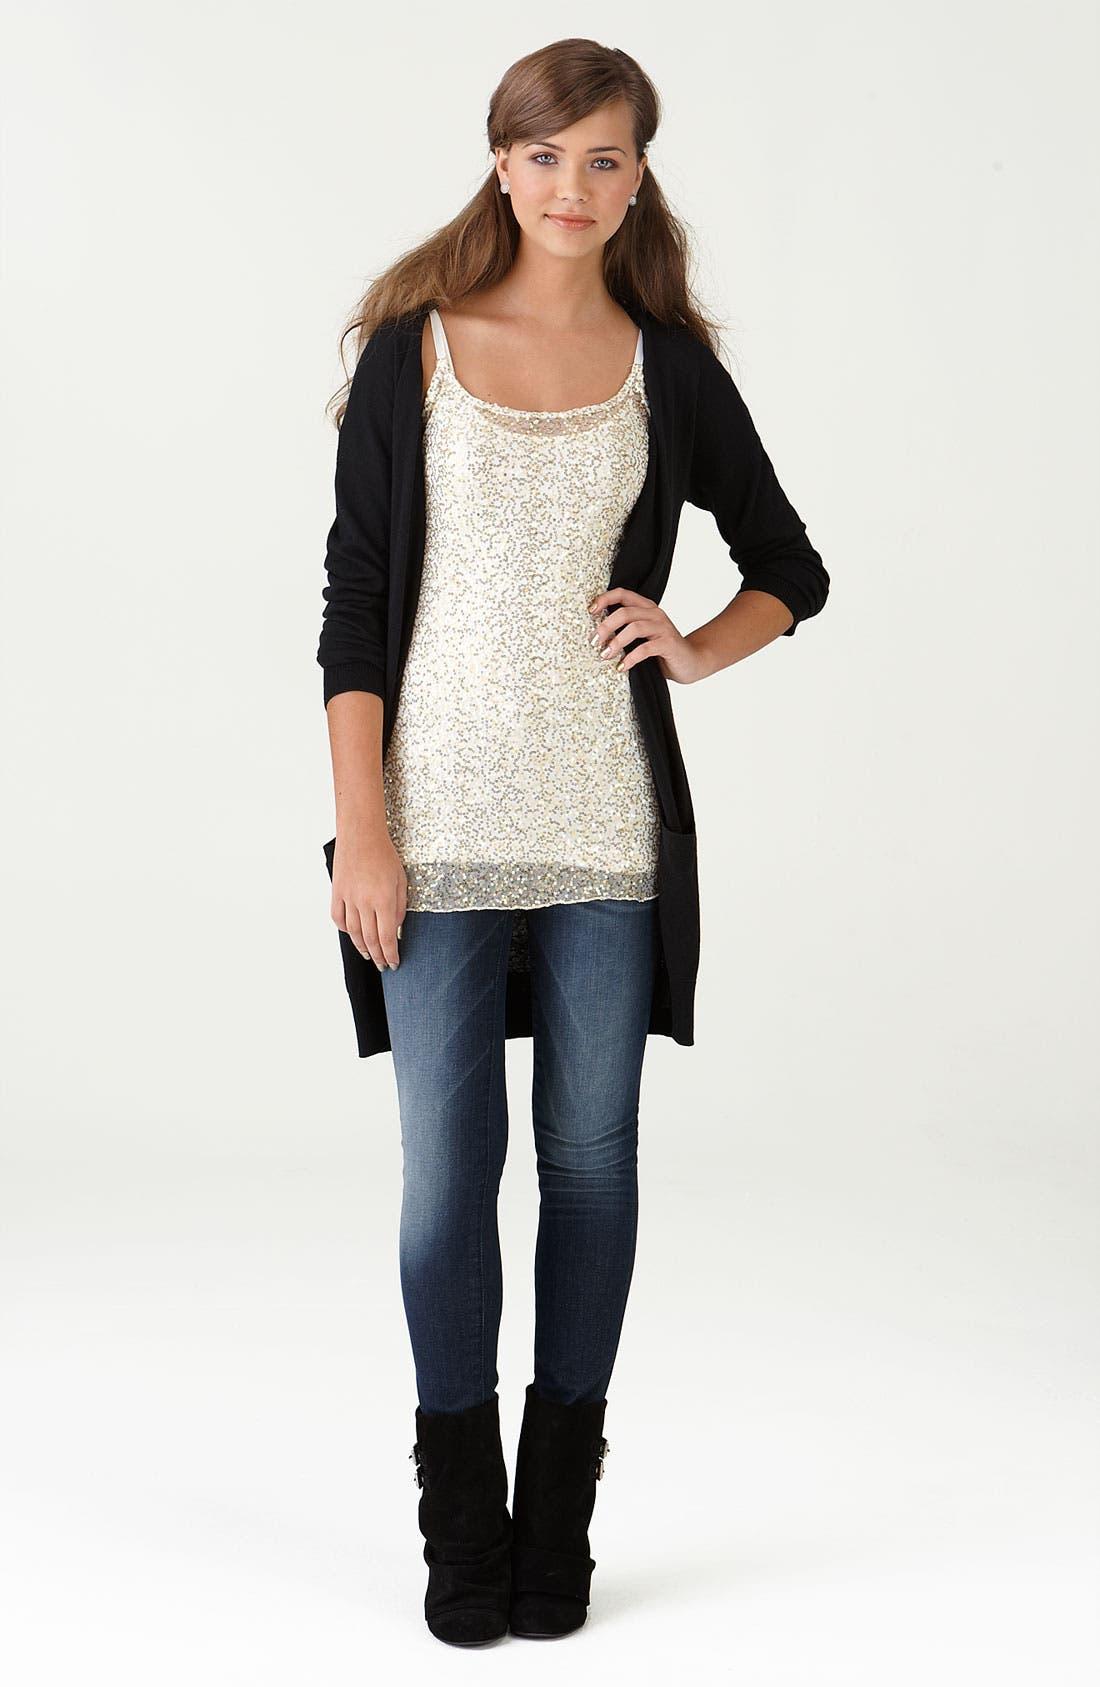 Main Image - Frenchi® Cardigan, h.i.p. Tunic & Vigoss Jeans